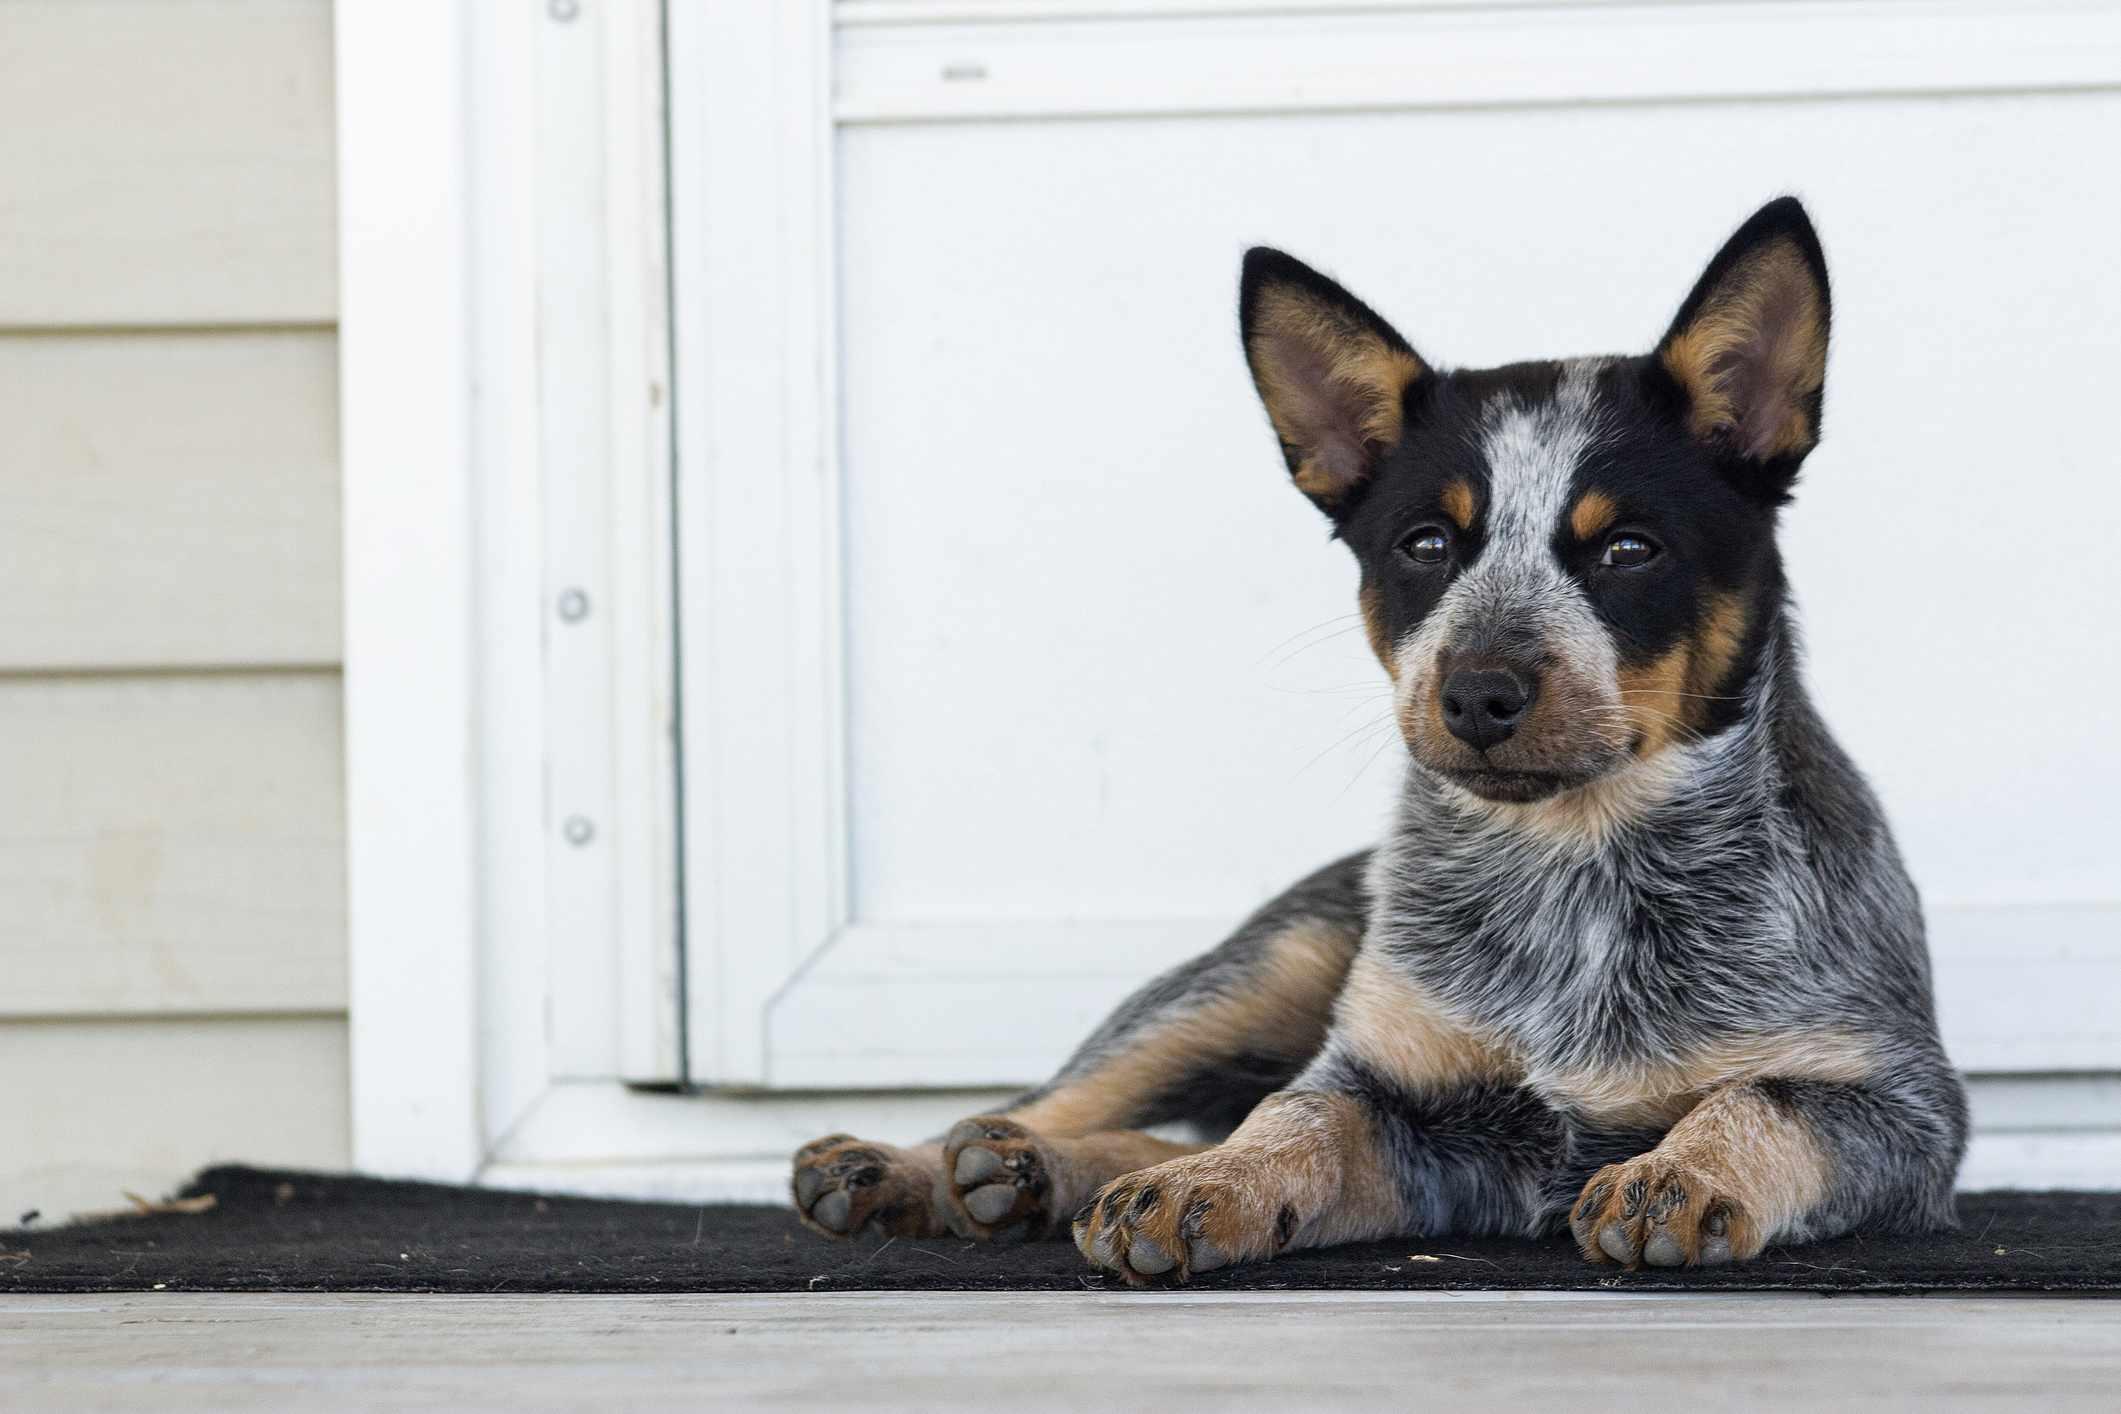 An Australian cattle dog puppy sitting on a porch